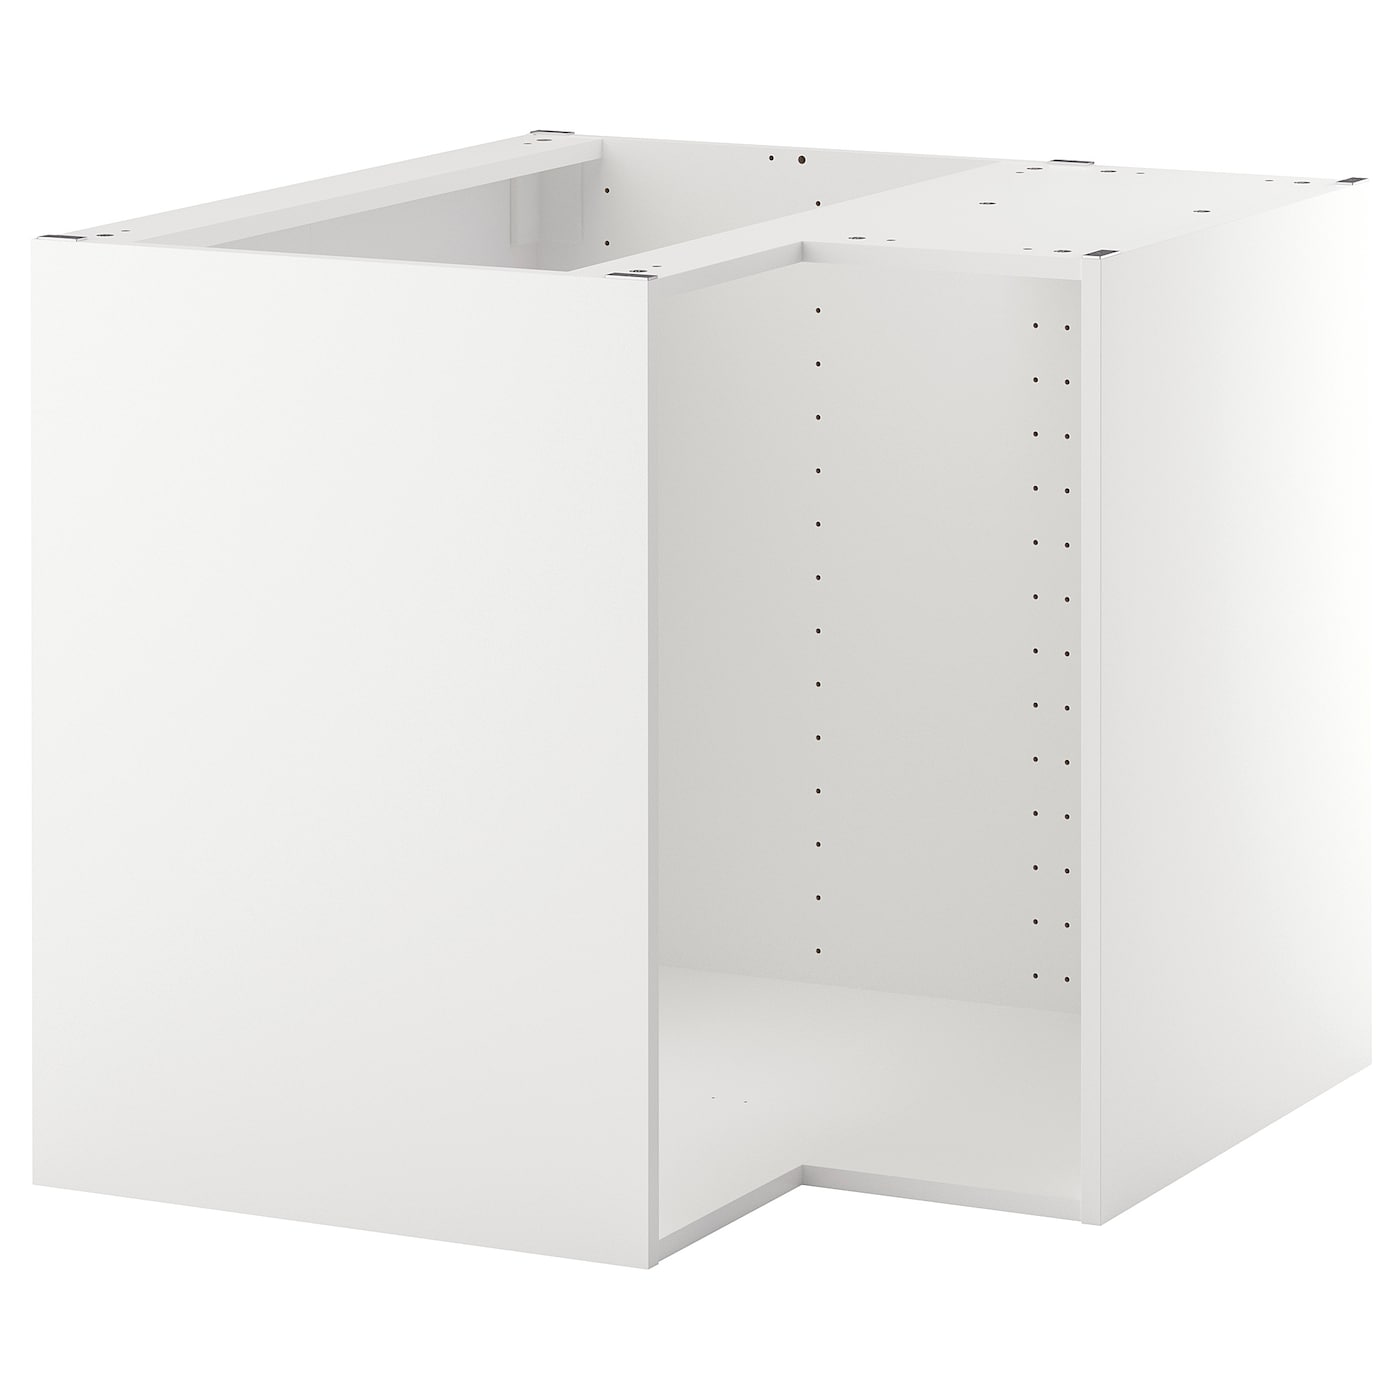 Metod Basiselement Onderhoekkast Wit 88x88x80 Cm Ikea